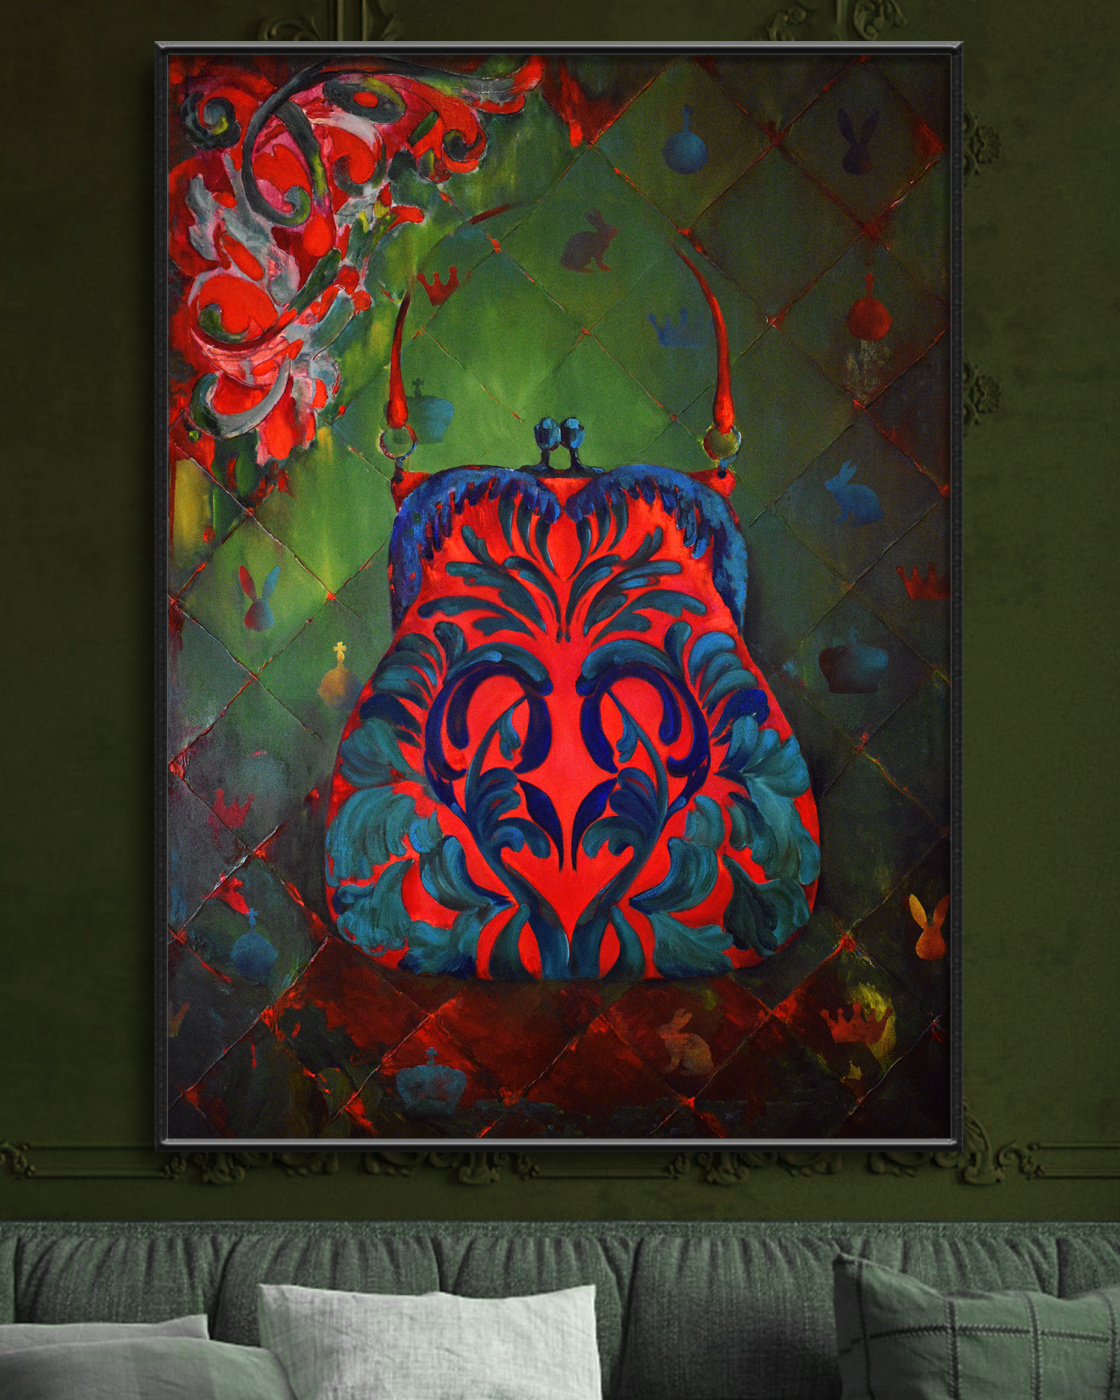 GLAMOUR AA 110*80 cm, original oil painting